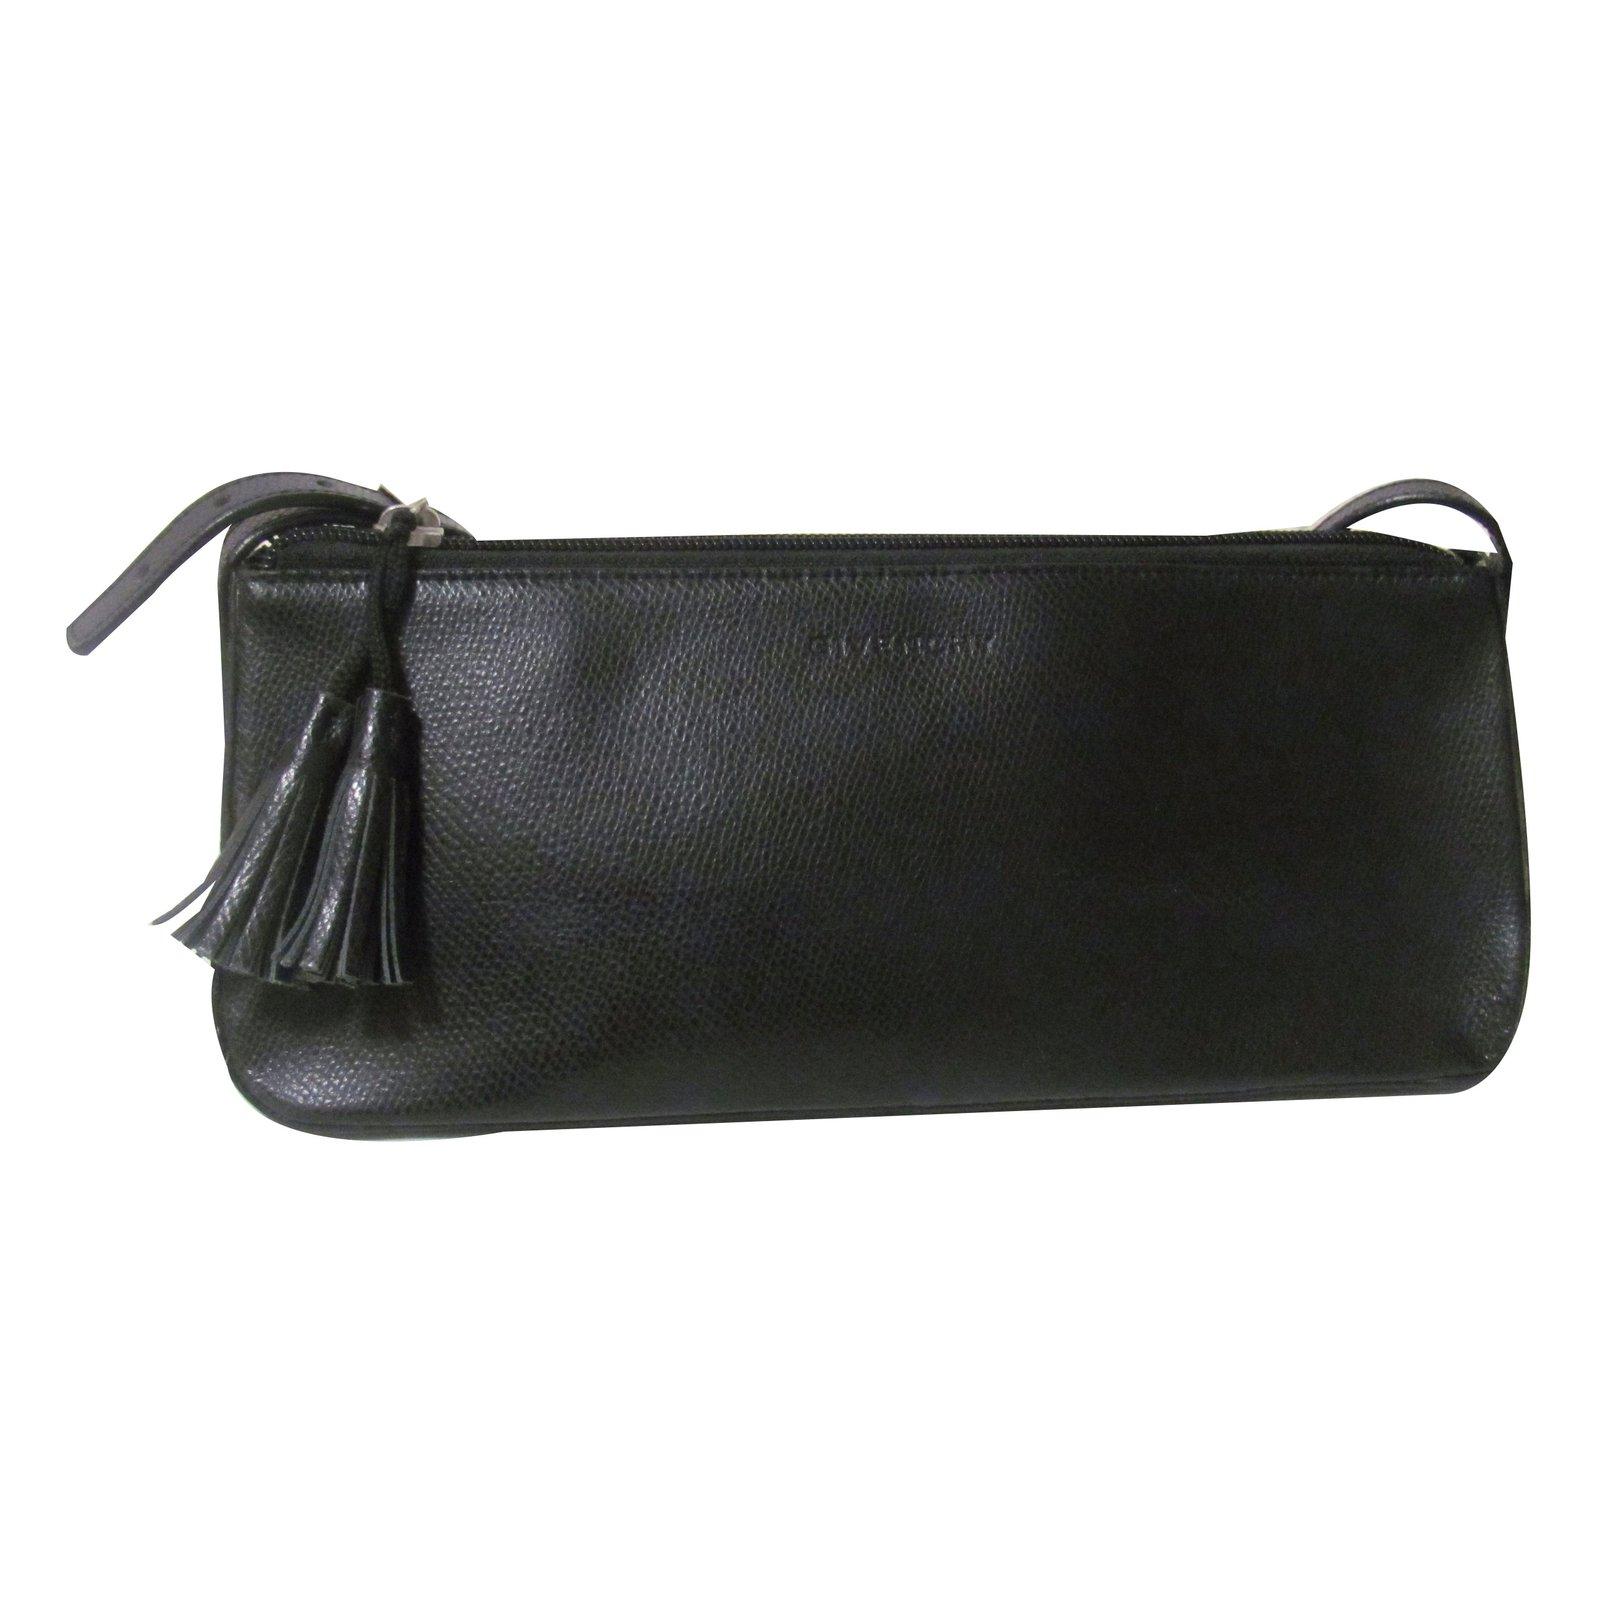 0d0182a13d Sacs à main Givenchy Sac pochette Cuir Noir ref.28185 - Joli Closet